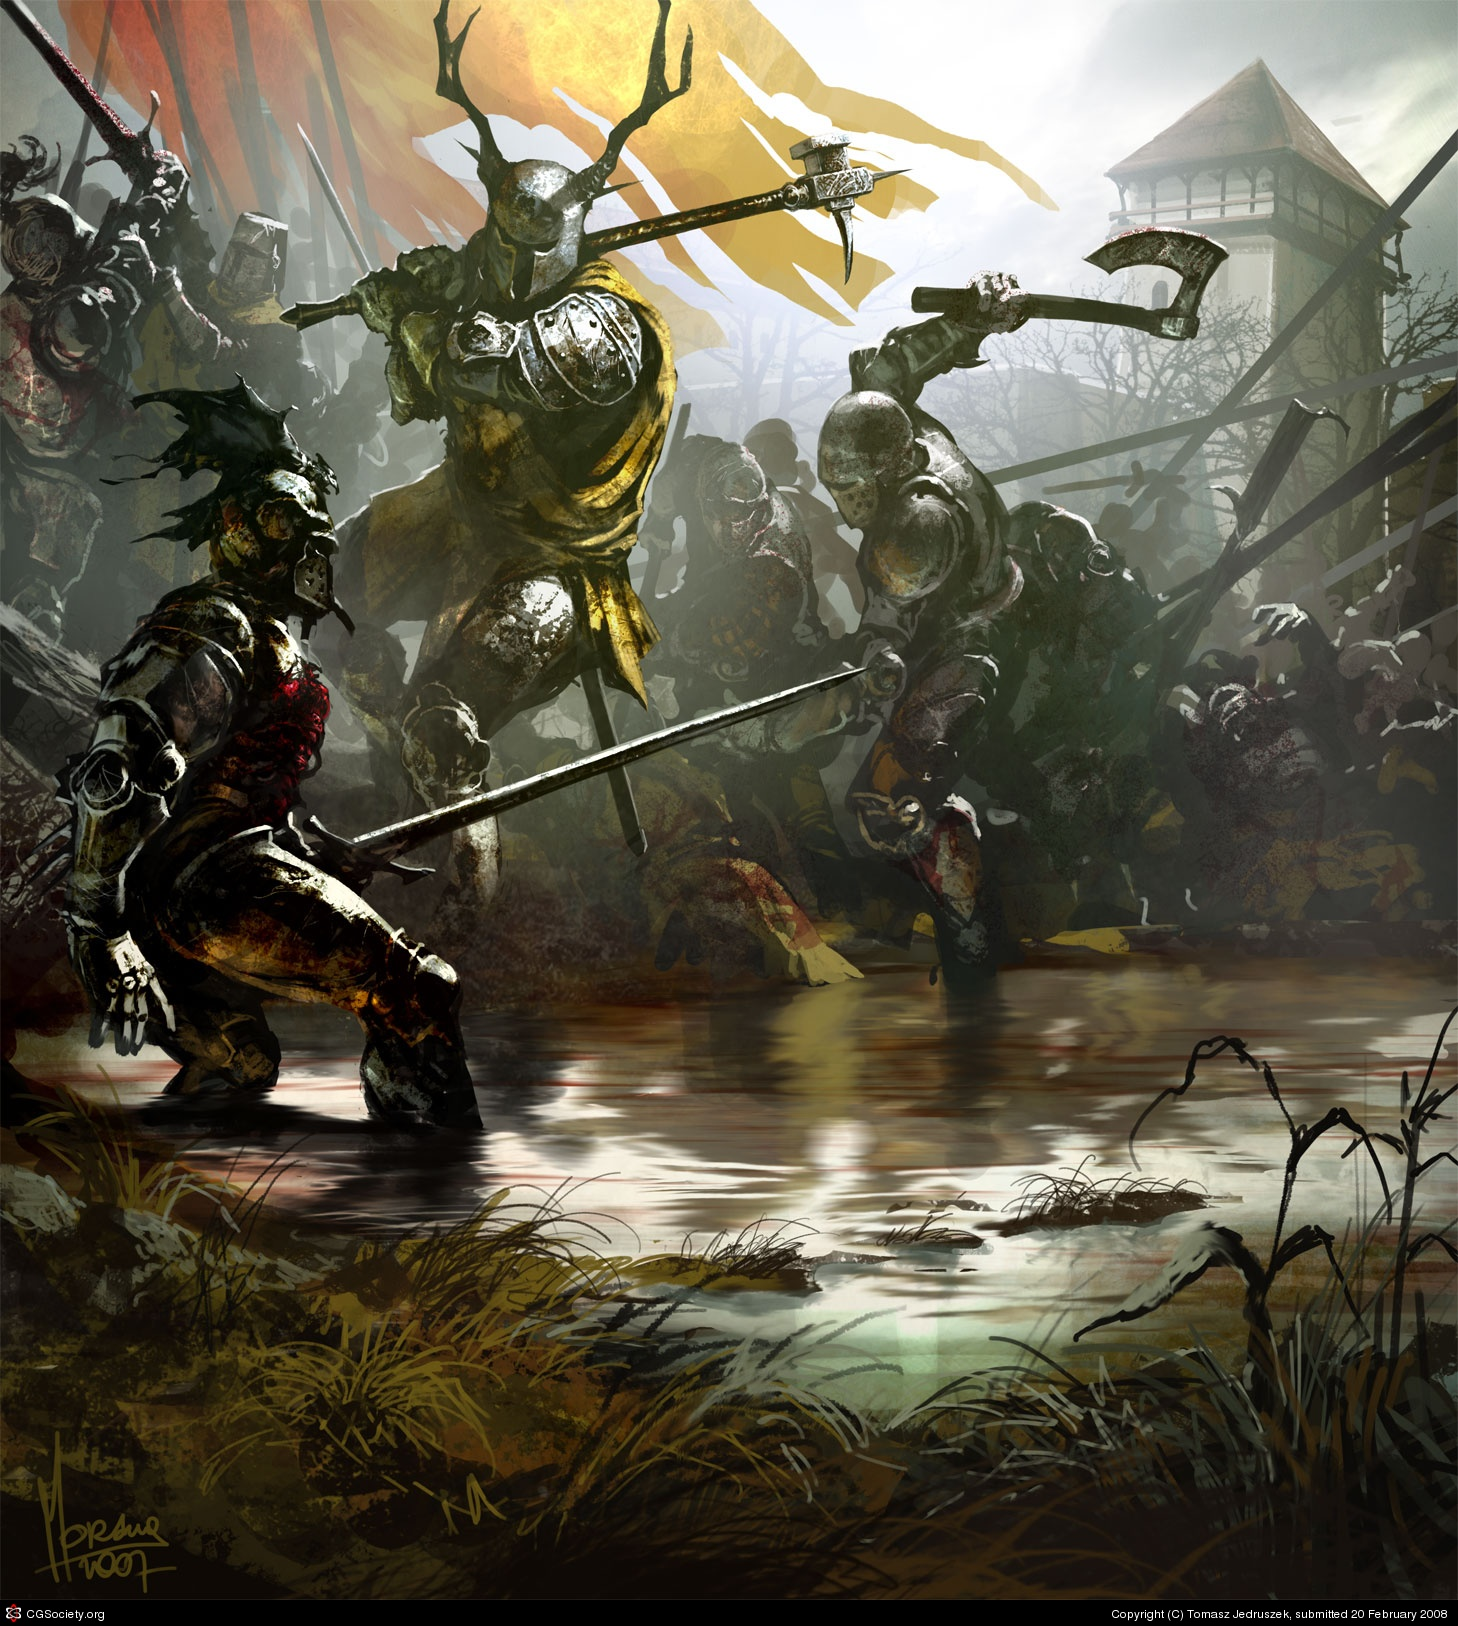 Robert Baratheon: Robert Baratheon, First Of His Name